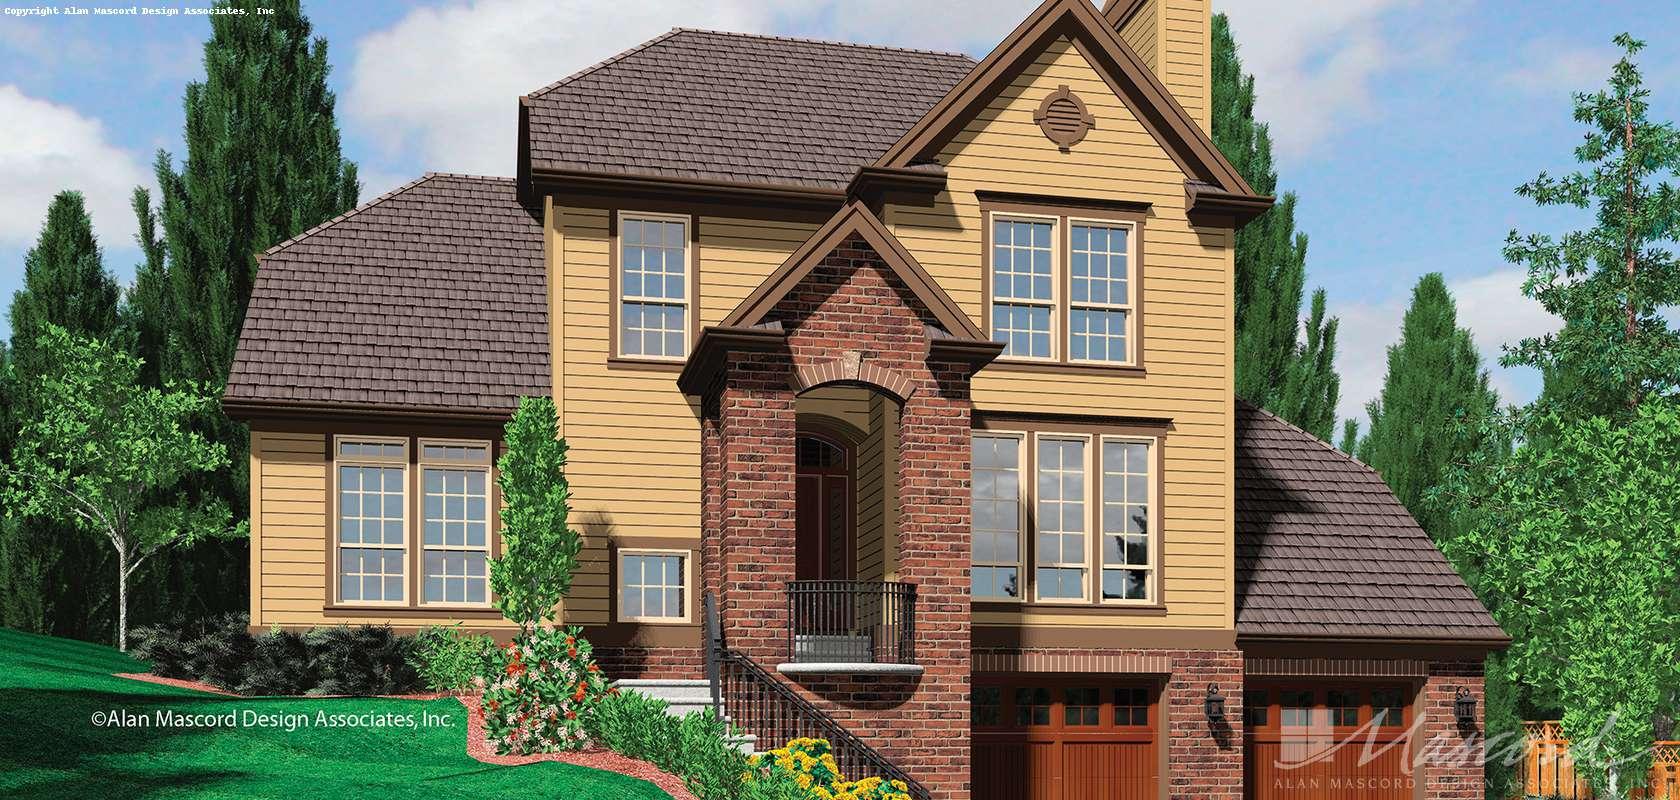 Mascord House Plan 22147A: The Kingsley